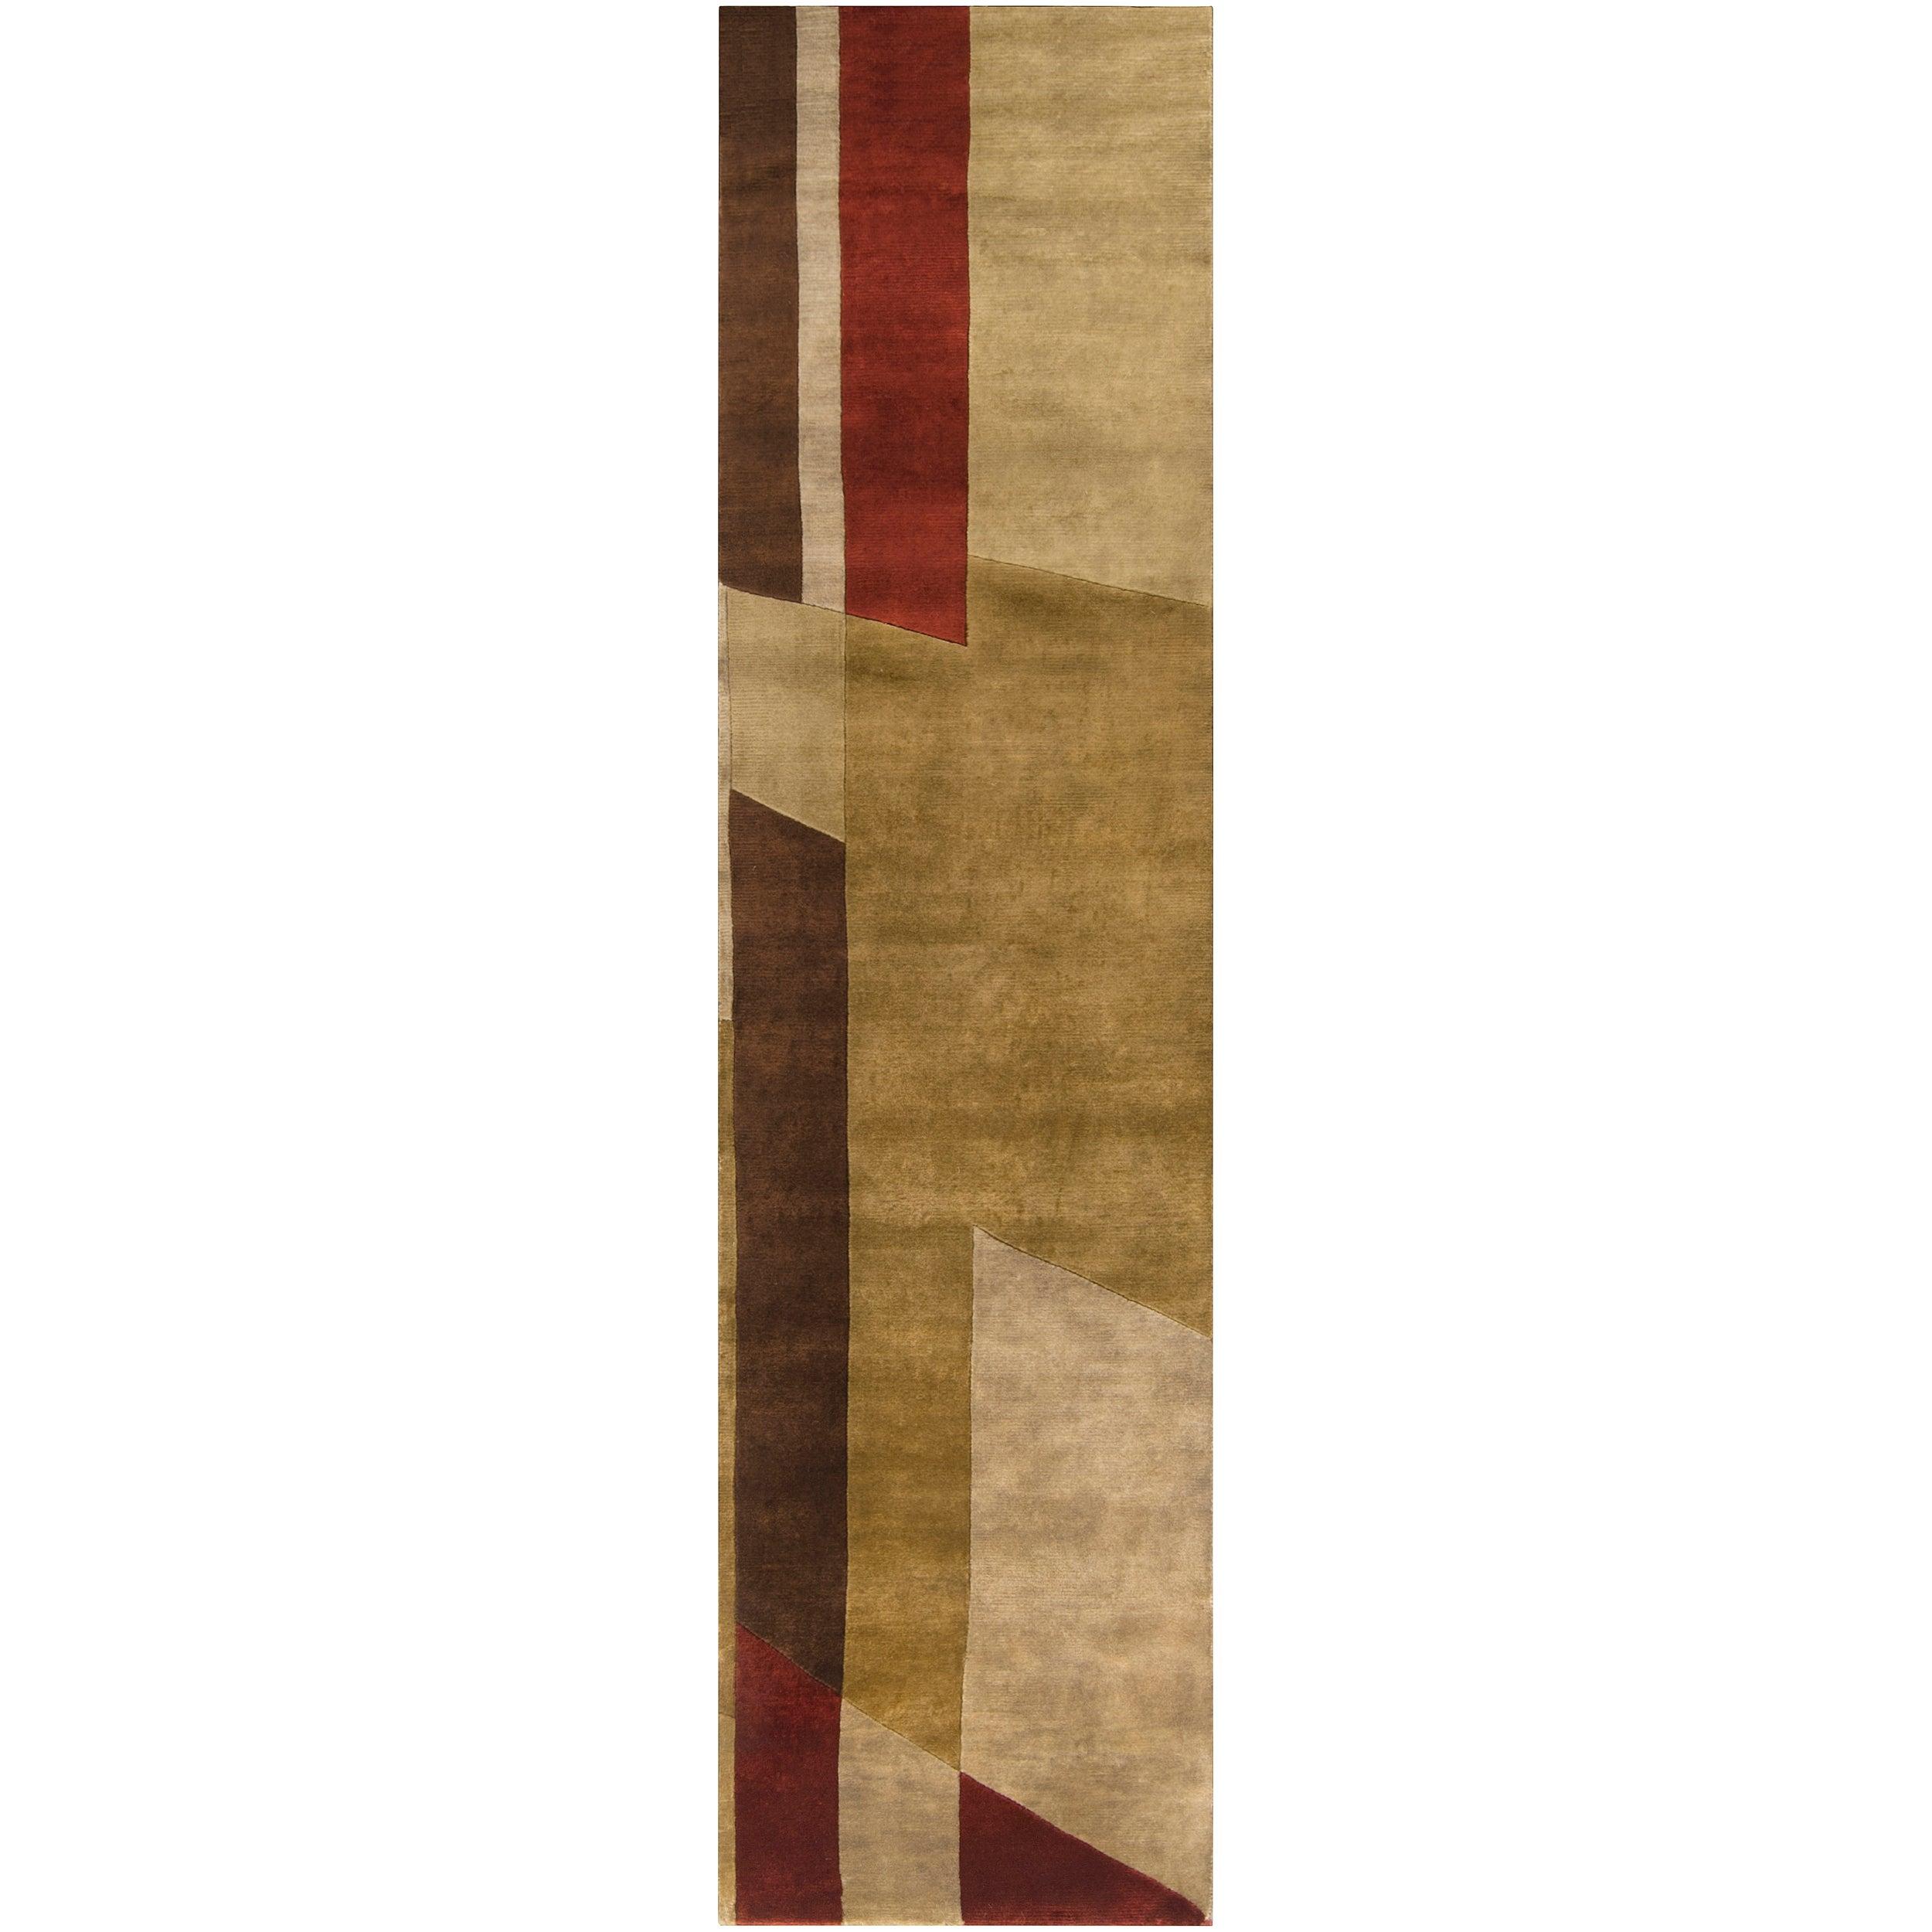 Hand-knotted Multicolored La Crosse Geometric Semi-Worsted Wool Rug (2'6 x 10')